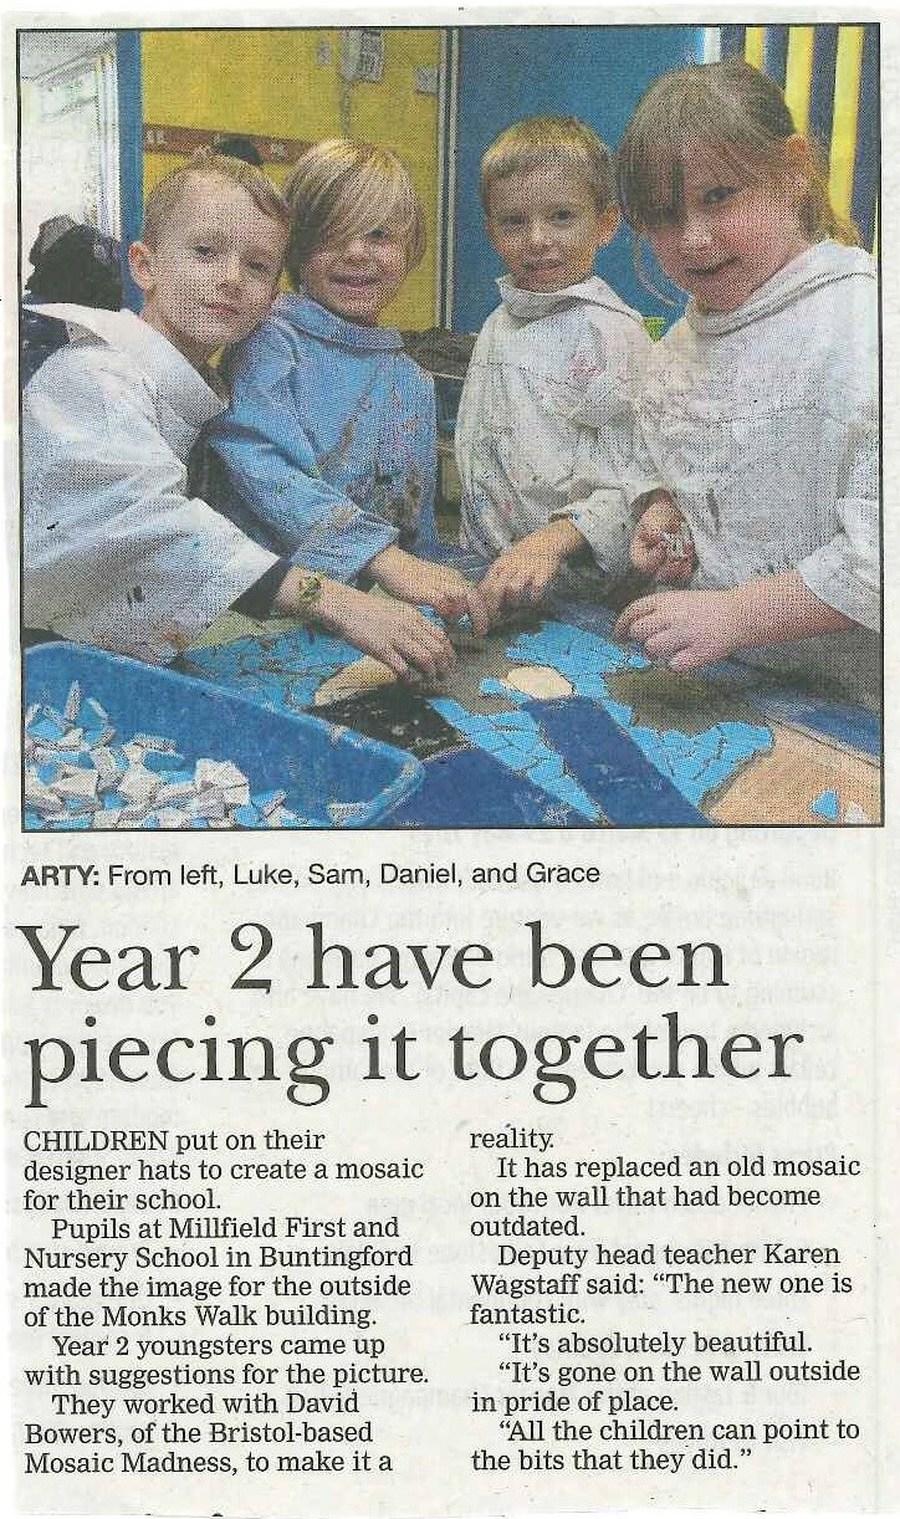 Millfield First Nursery School Local Newspapers